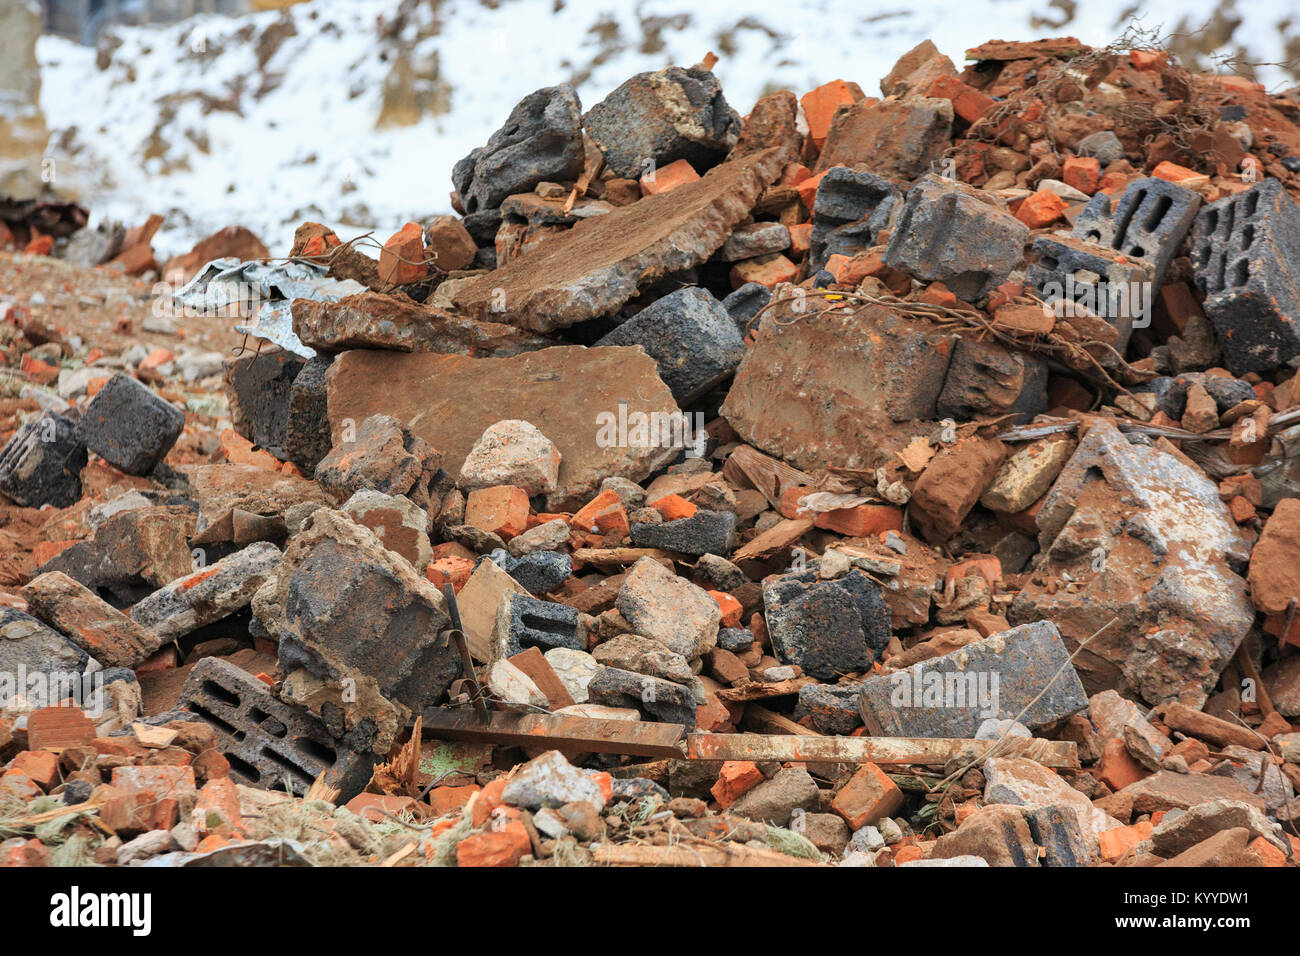 Pile Of Building Debris : Building demolition by implosion stock photos